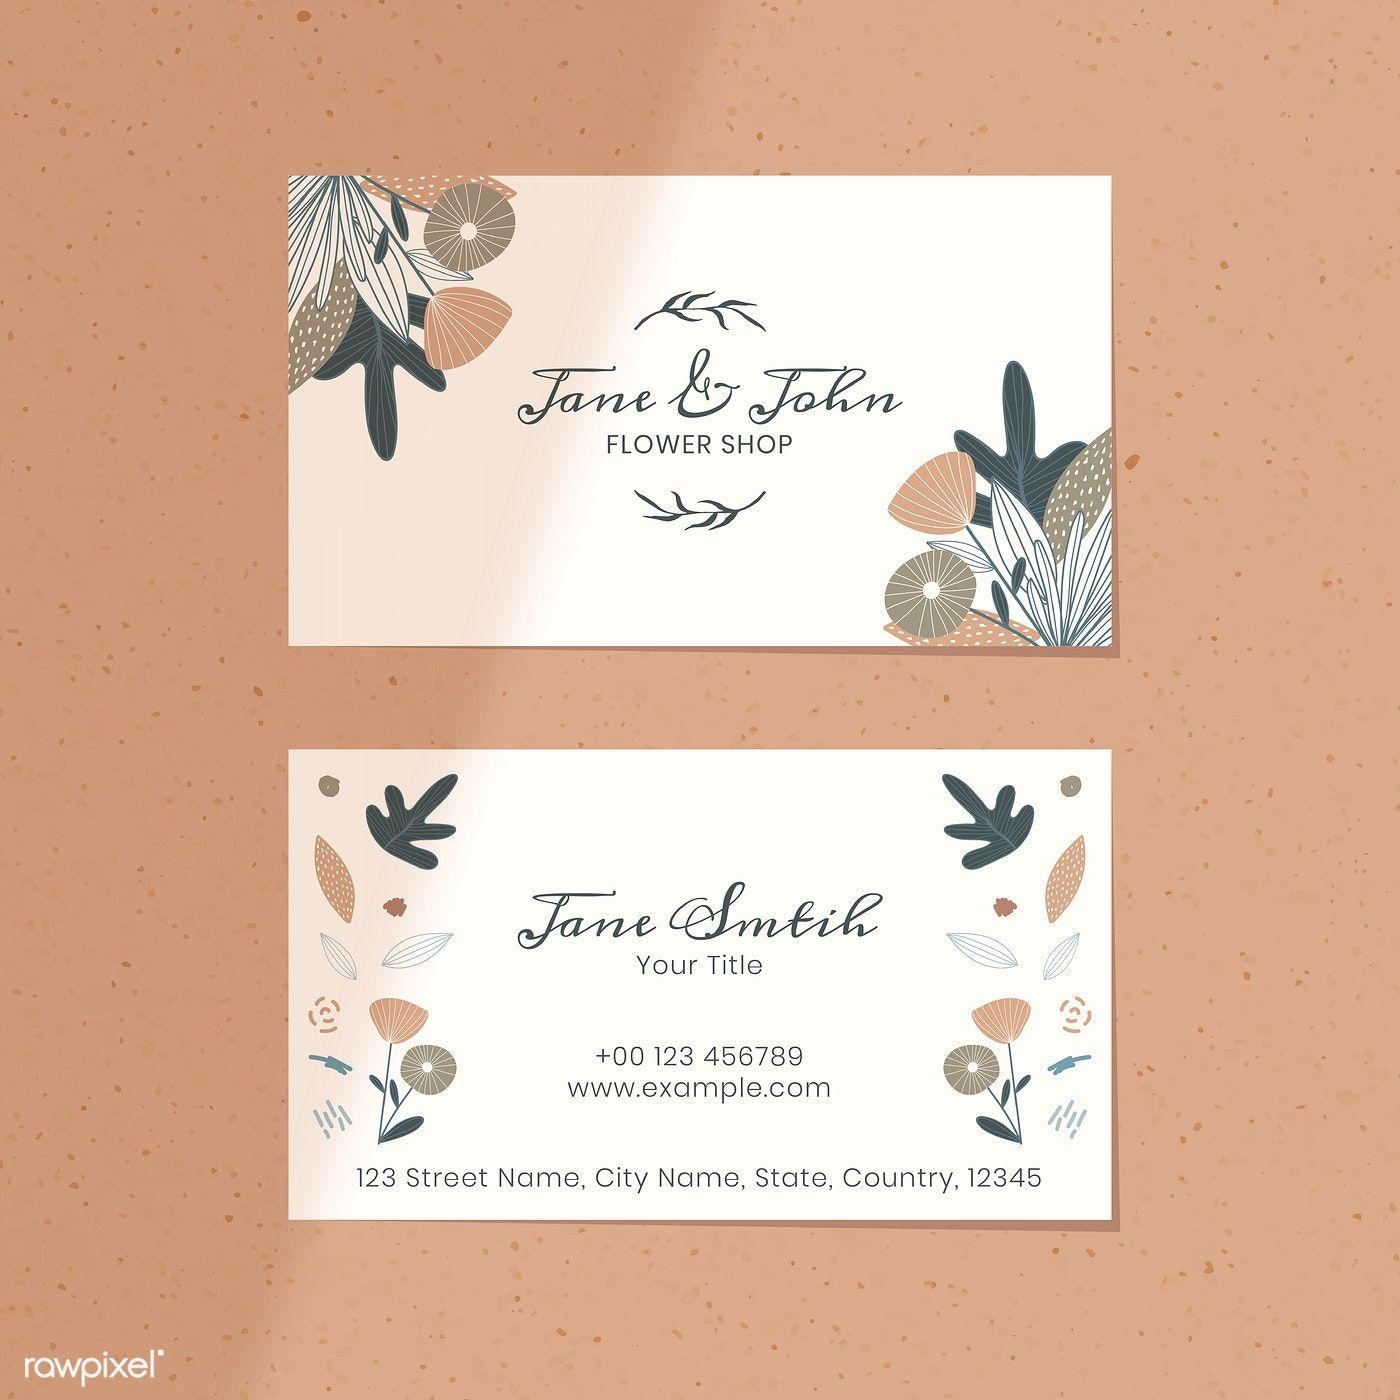 Floral Flower Shop Name Card Vector Premium Image By Rawpixel Com Katie Moir Flower Shop Names Name Cards Flower Shop